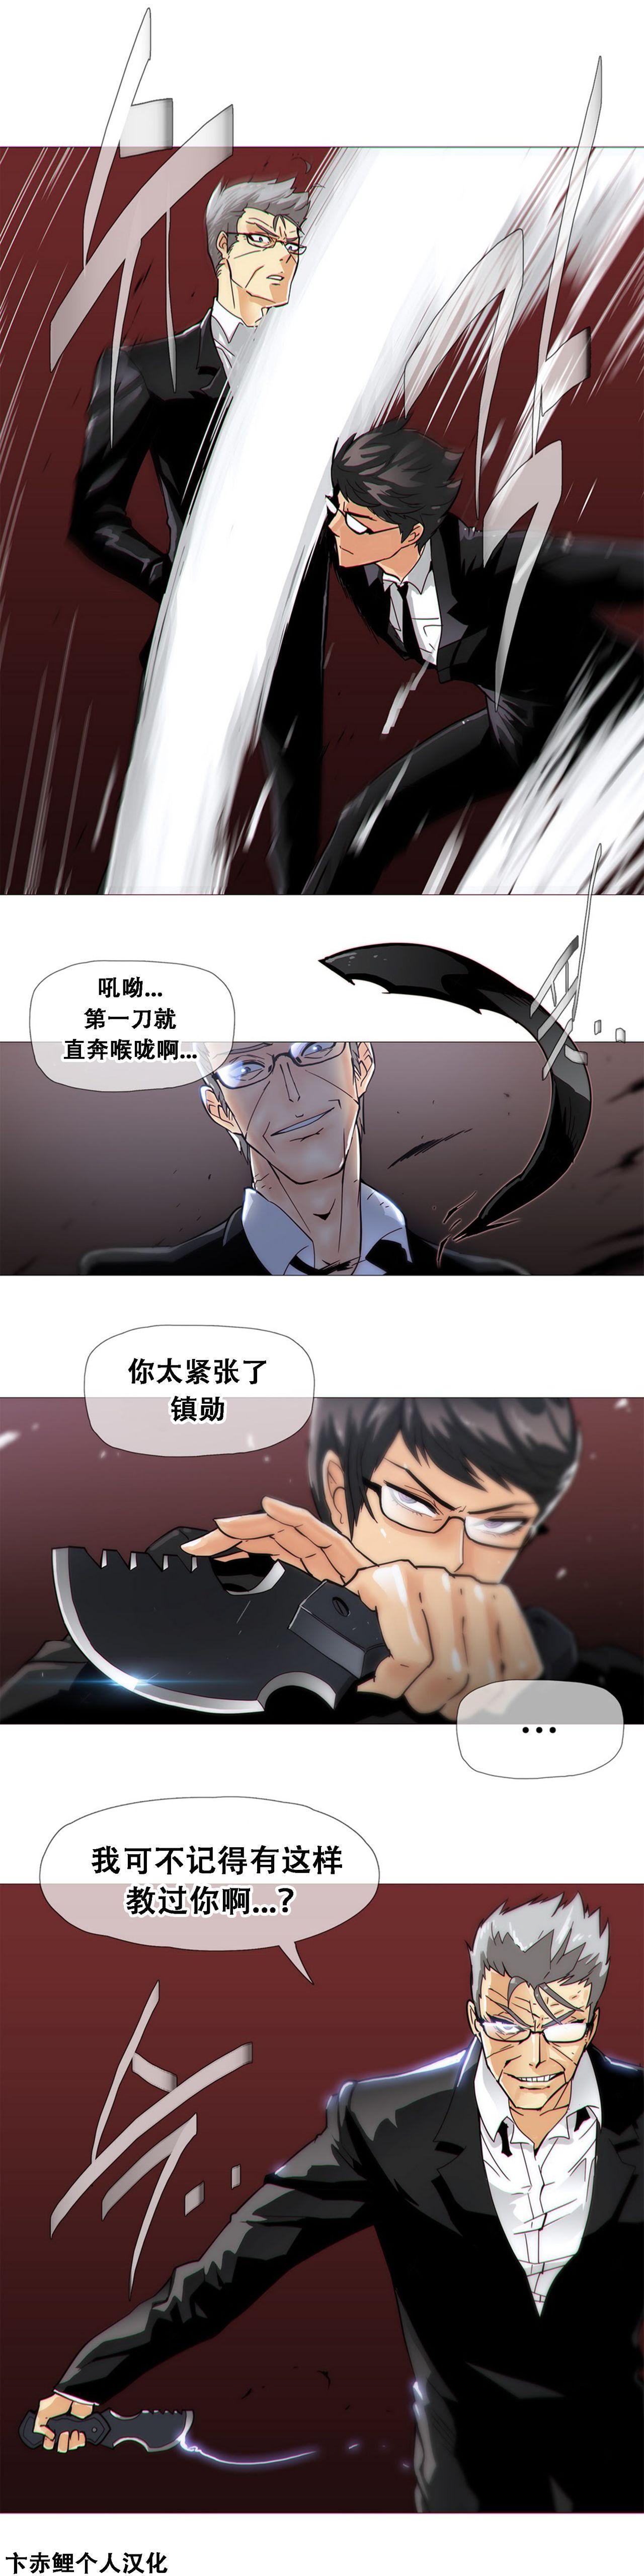 HouseHold Affairs 【卞赤鲤个人汉化】1~33话(持续更新中) 353